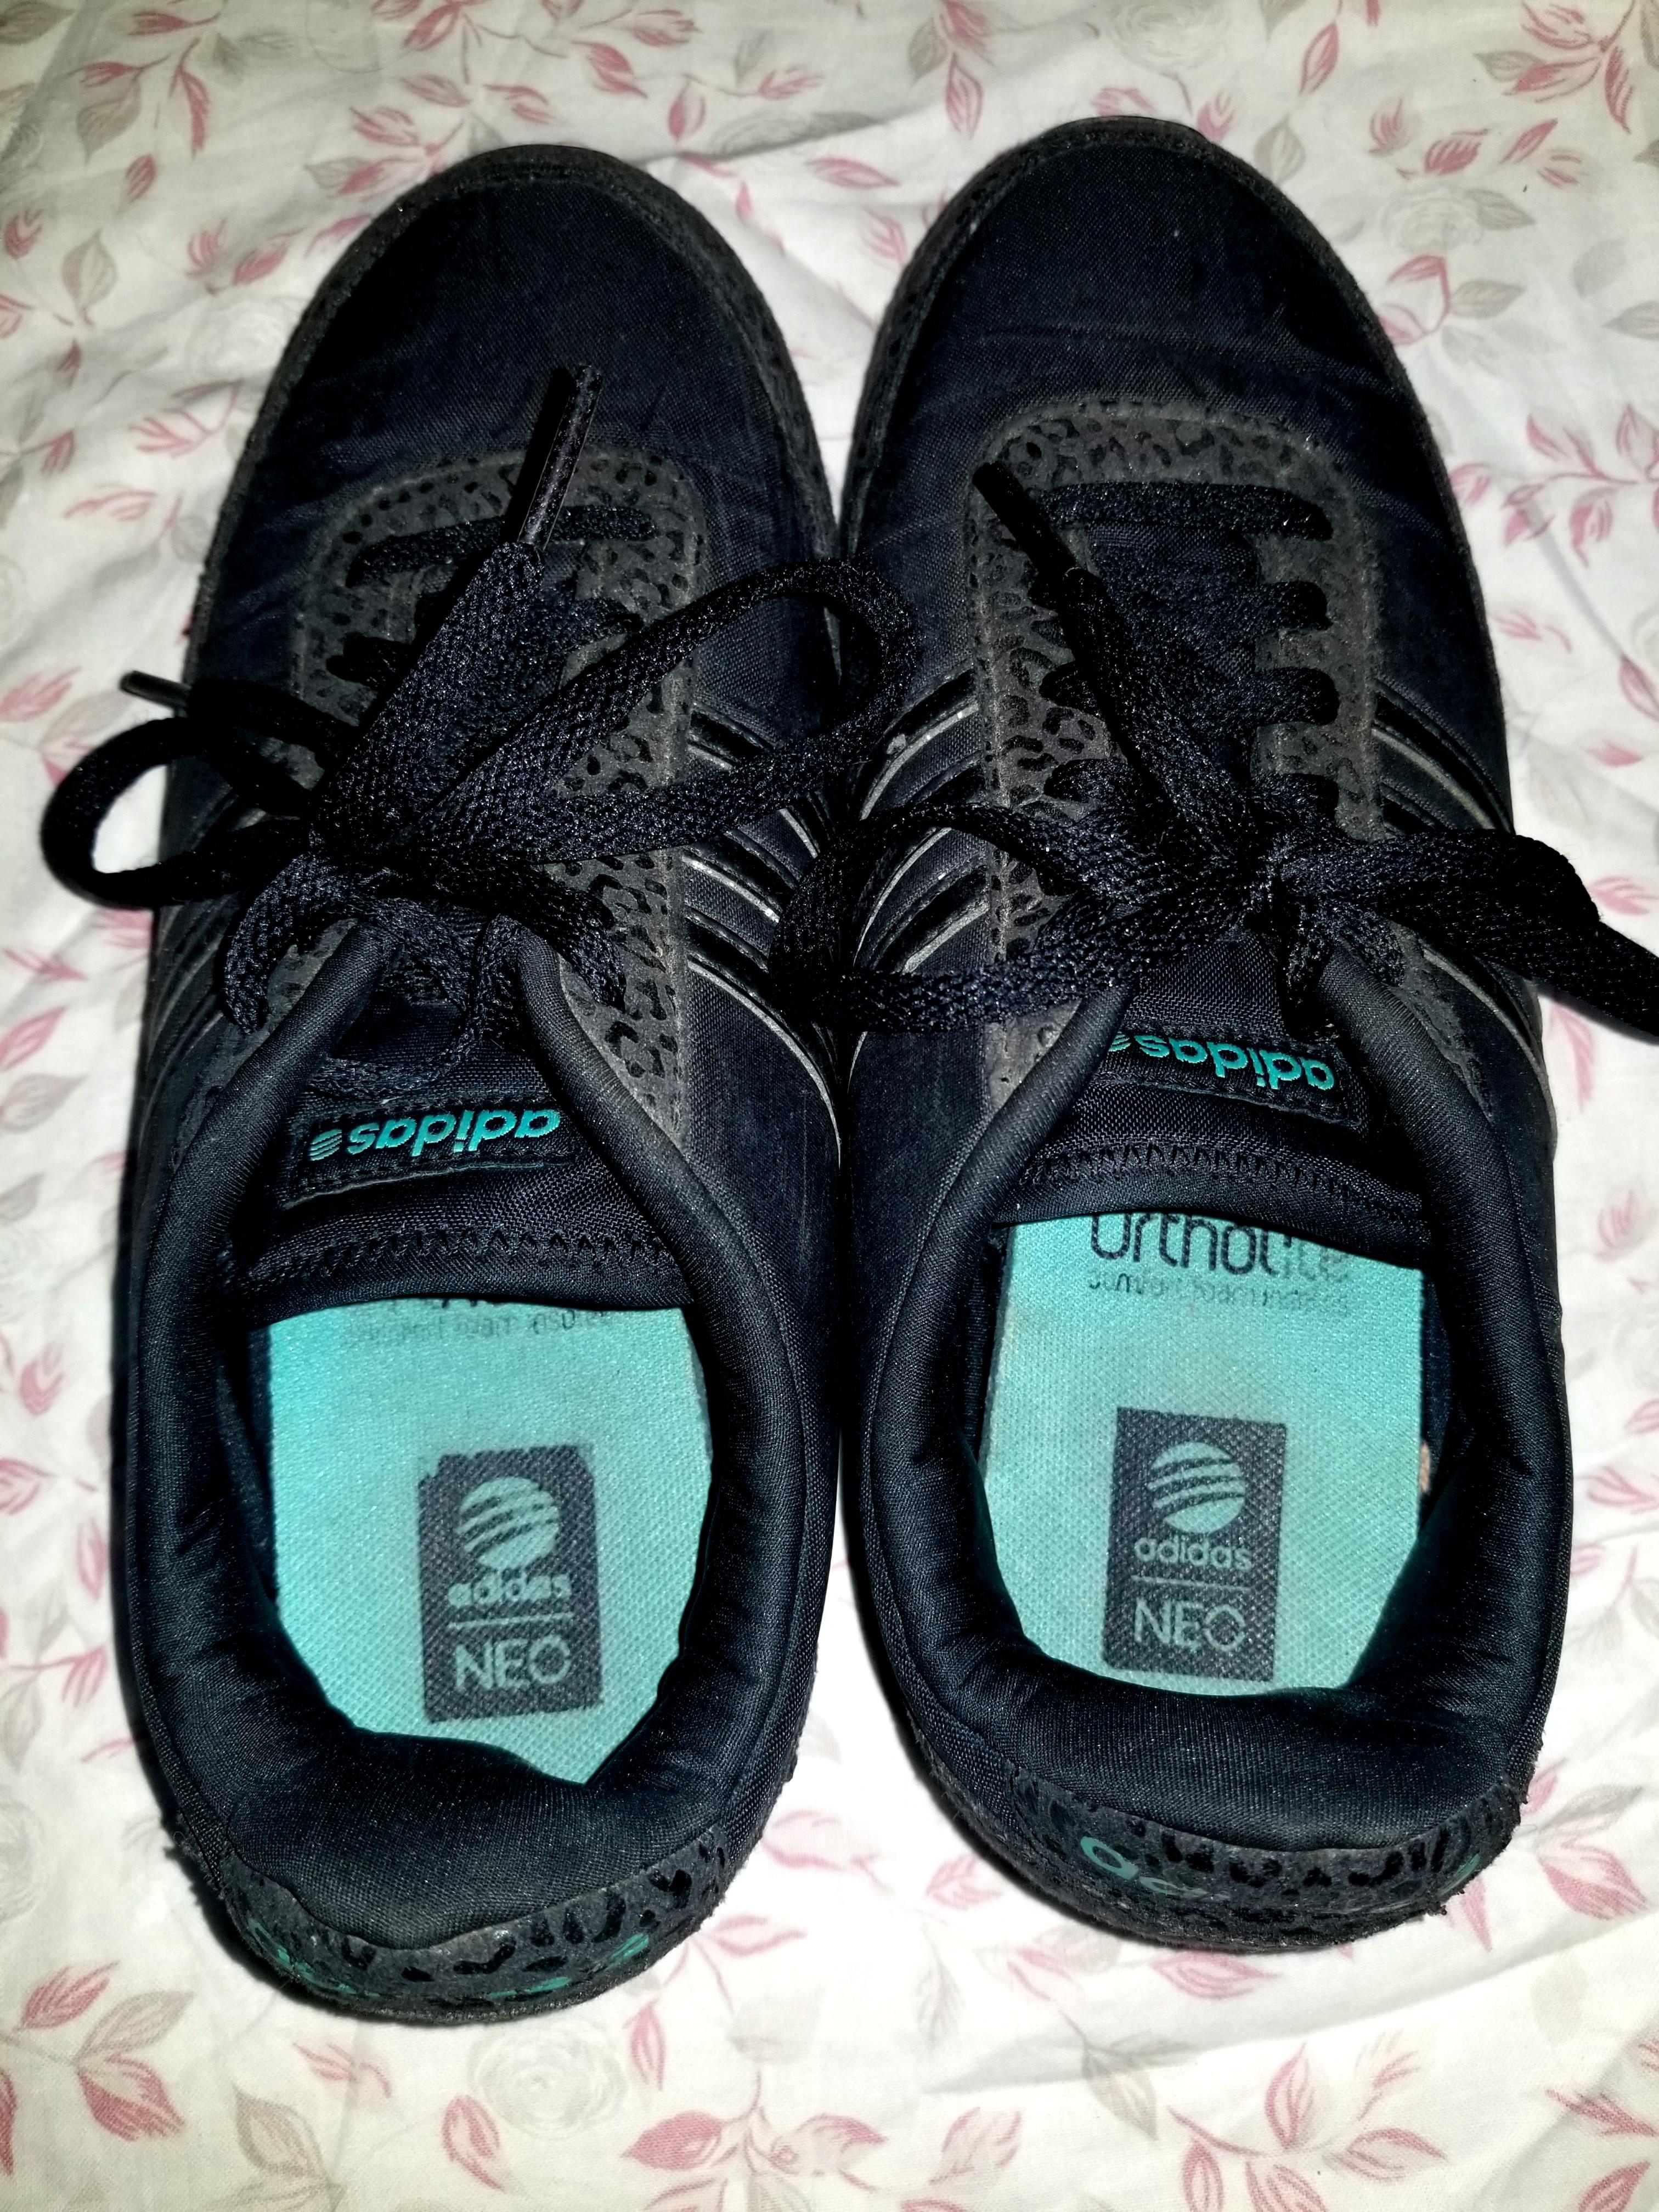 Adidas NEO Ortholite, Women's Fashion